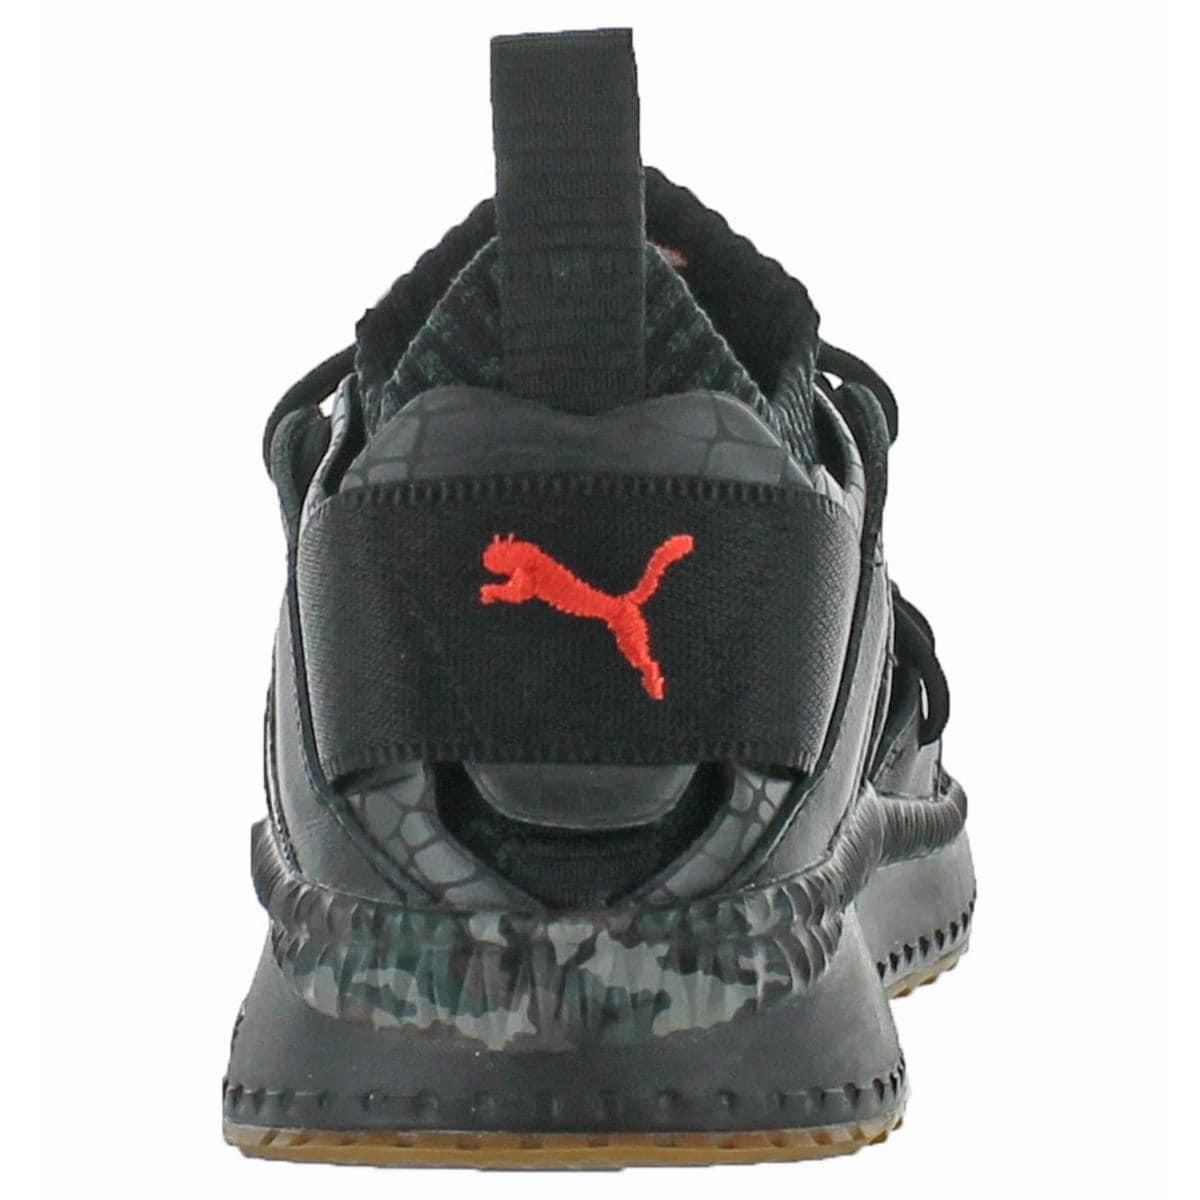 3e481aadabc04 Shop Puma Mens TSUGI Blaze evoKNIT Camo Fashion Sneakers Lightweight Casual  - Free Shipping Today - Overstock - 21429526